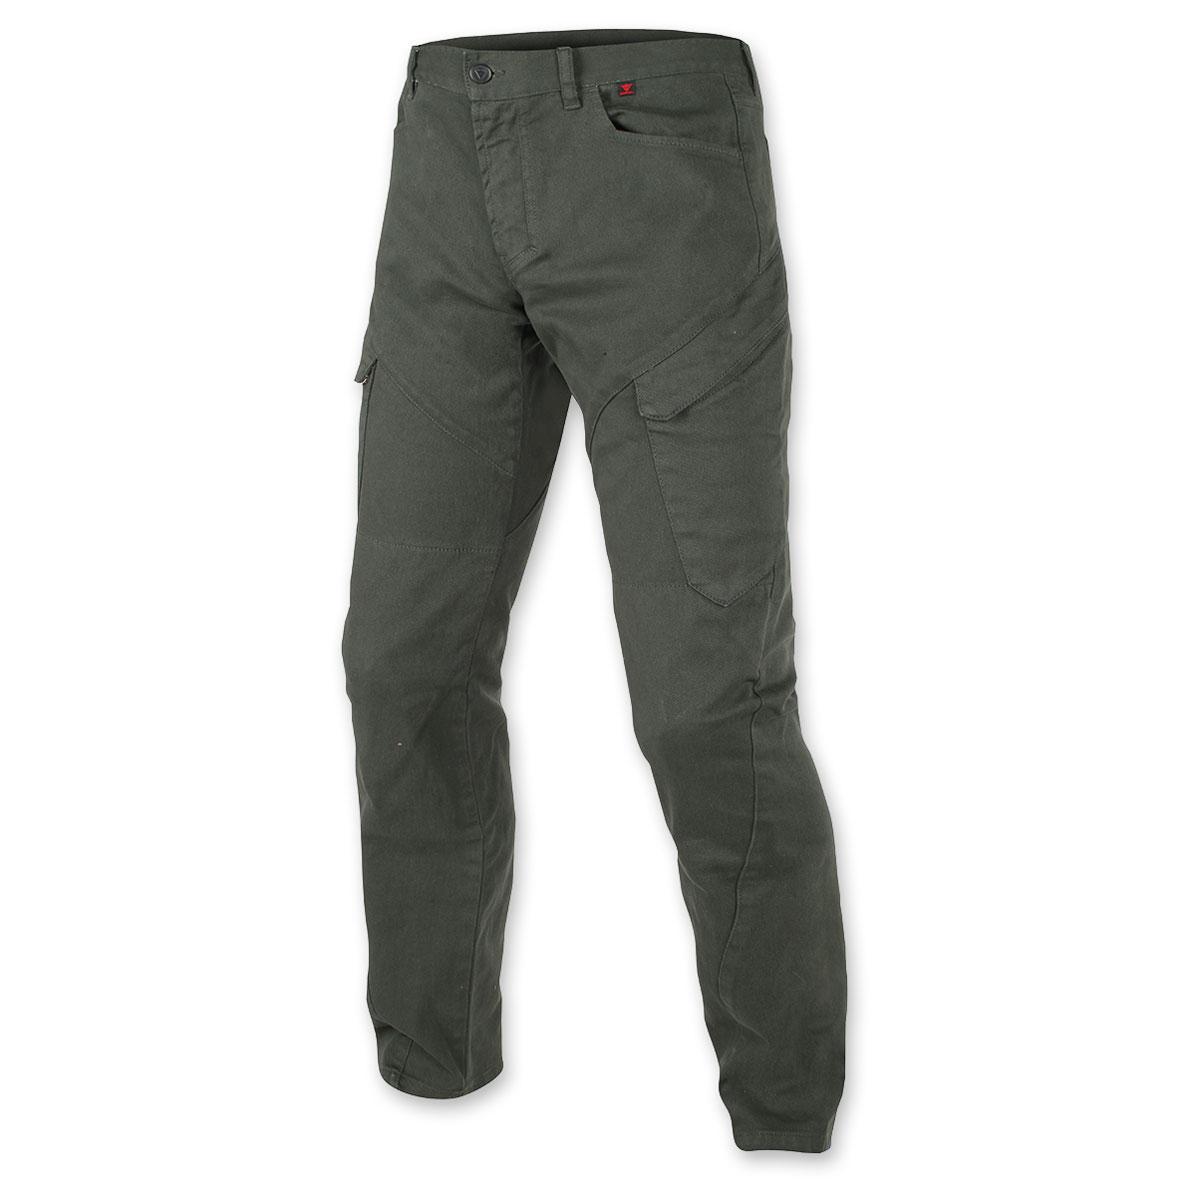 Dainese Men's Kargo Army Green Pants